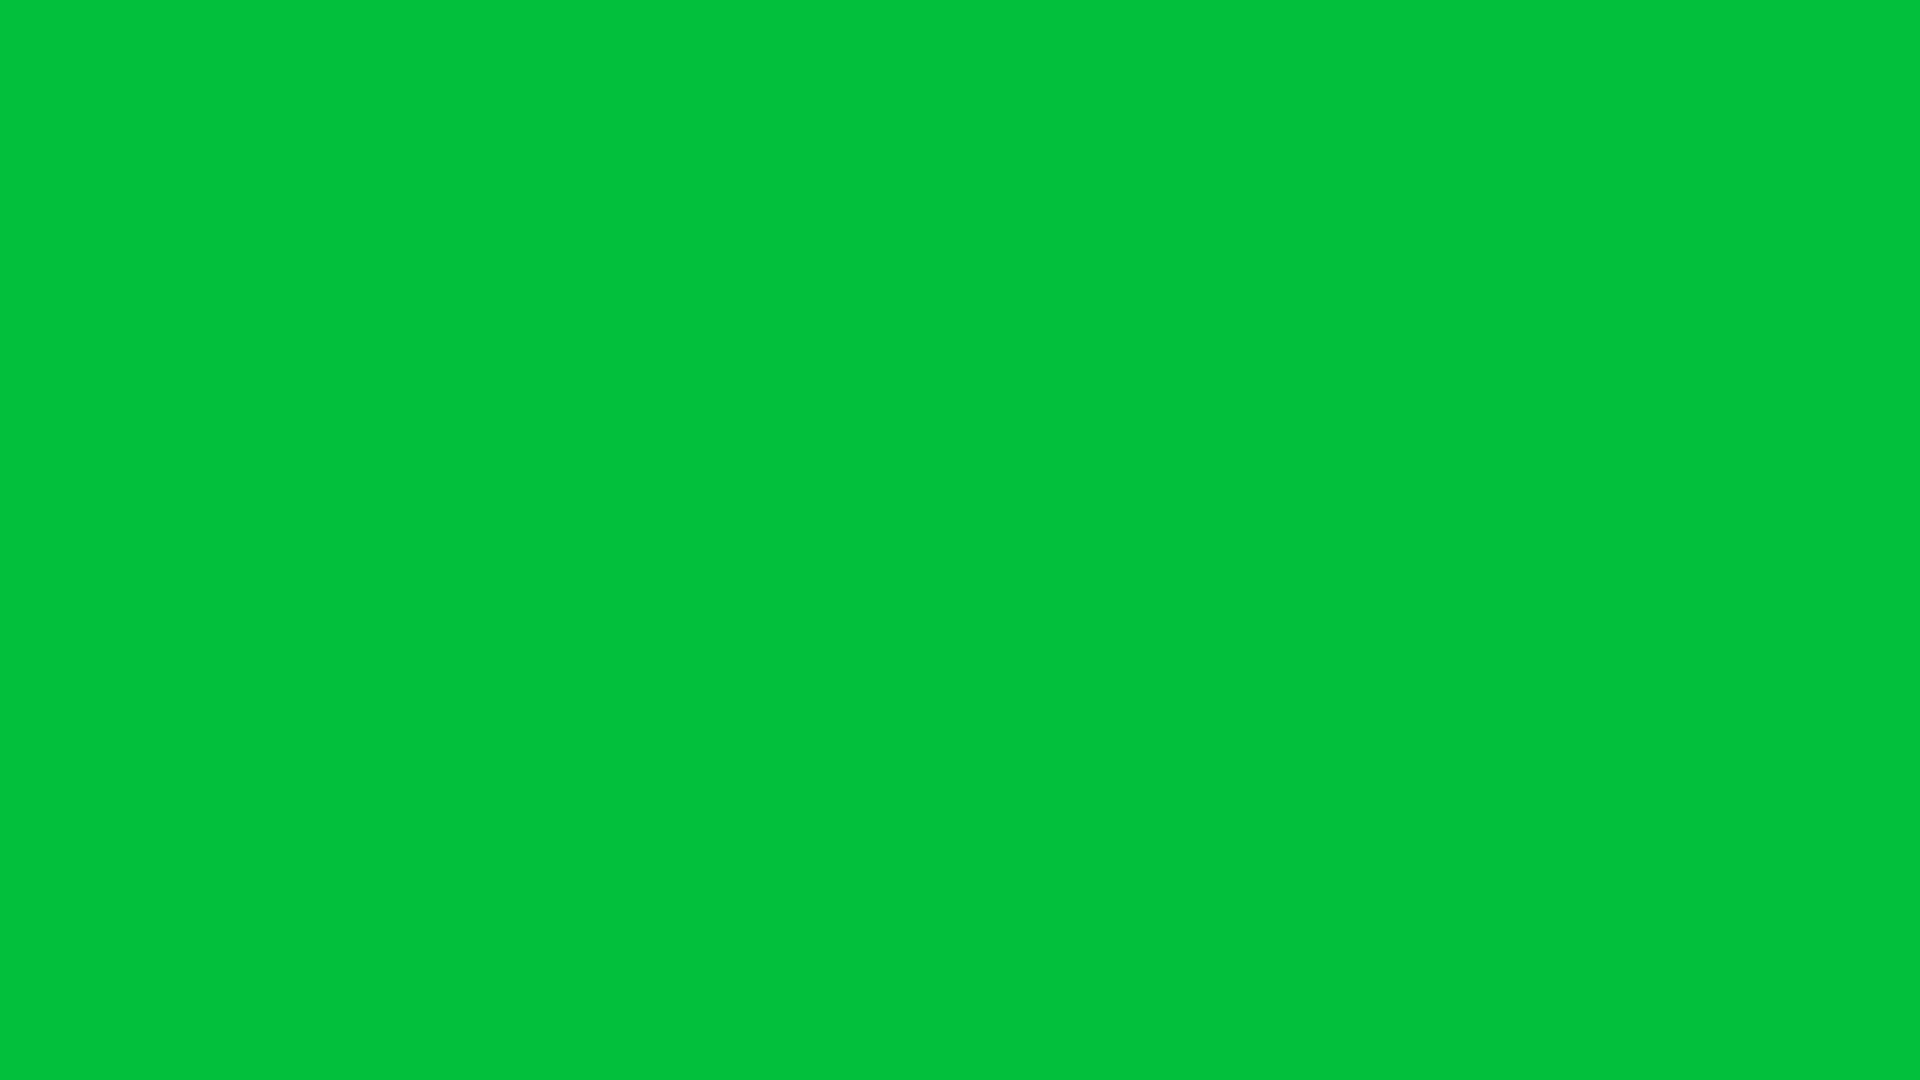 1920x1080 Dark Pastel Green Solid Color Background